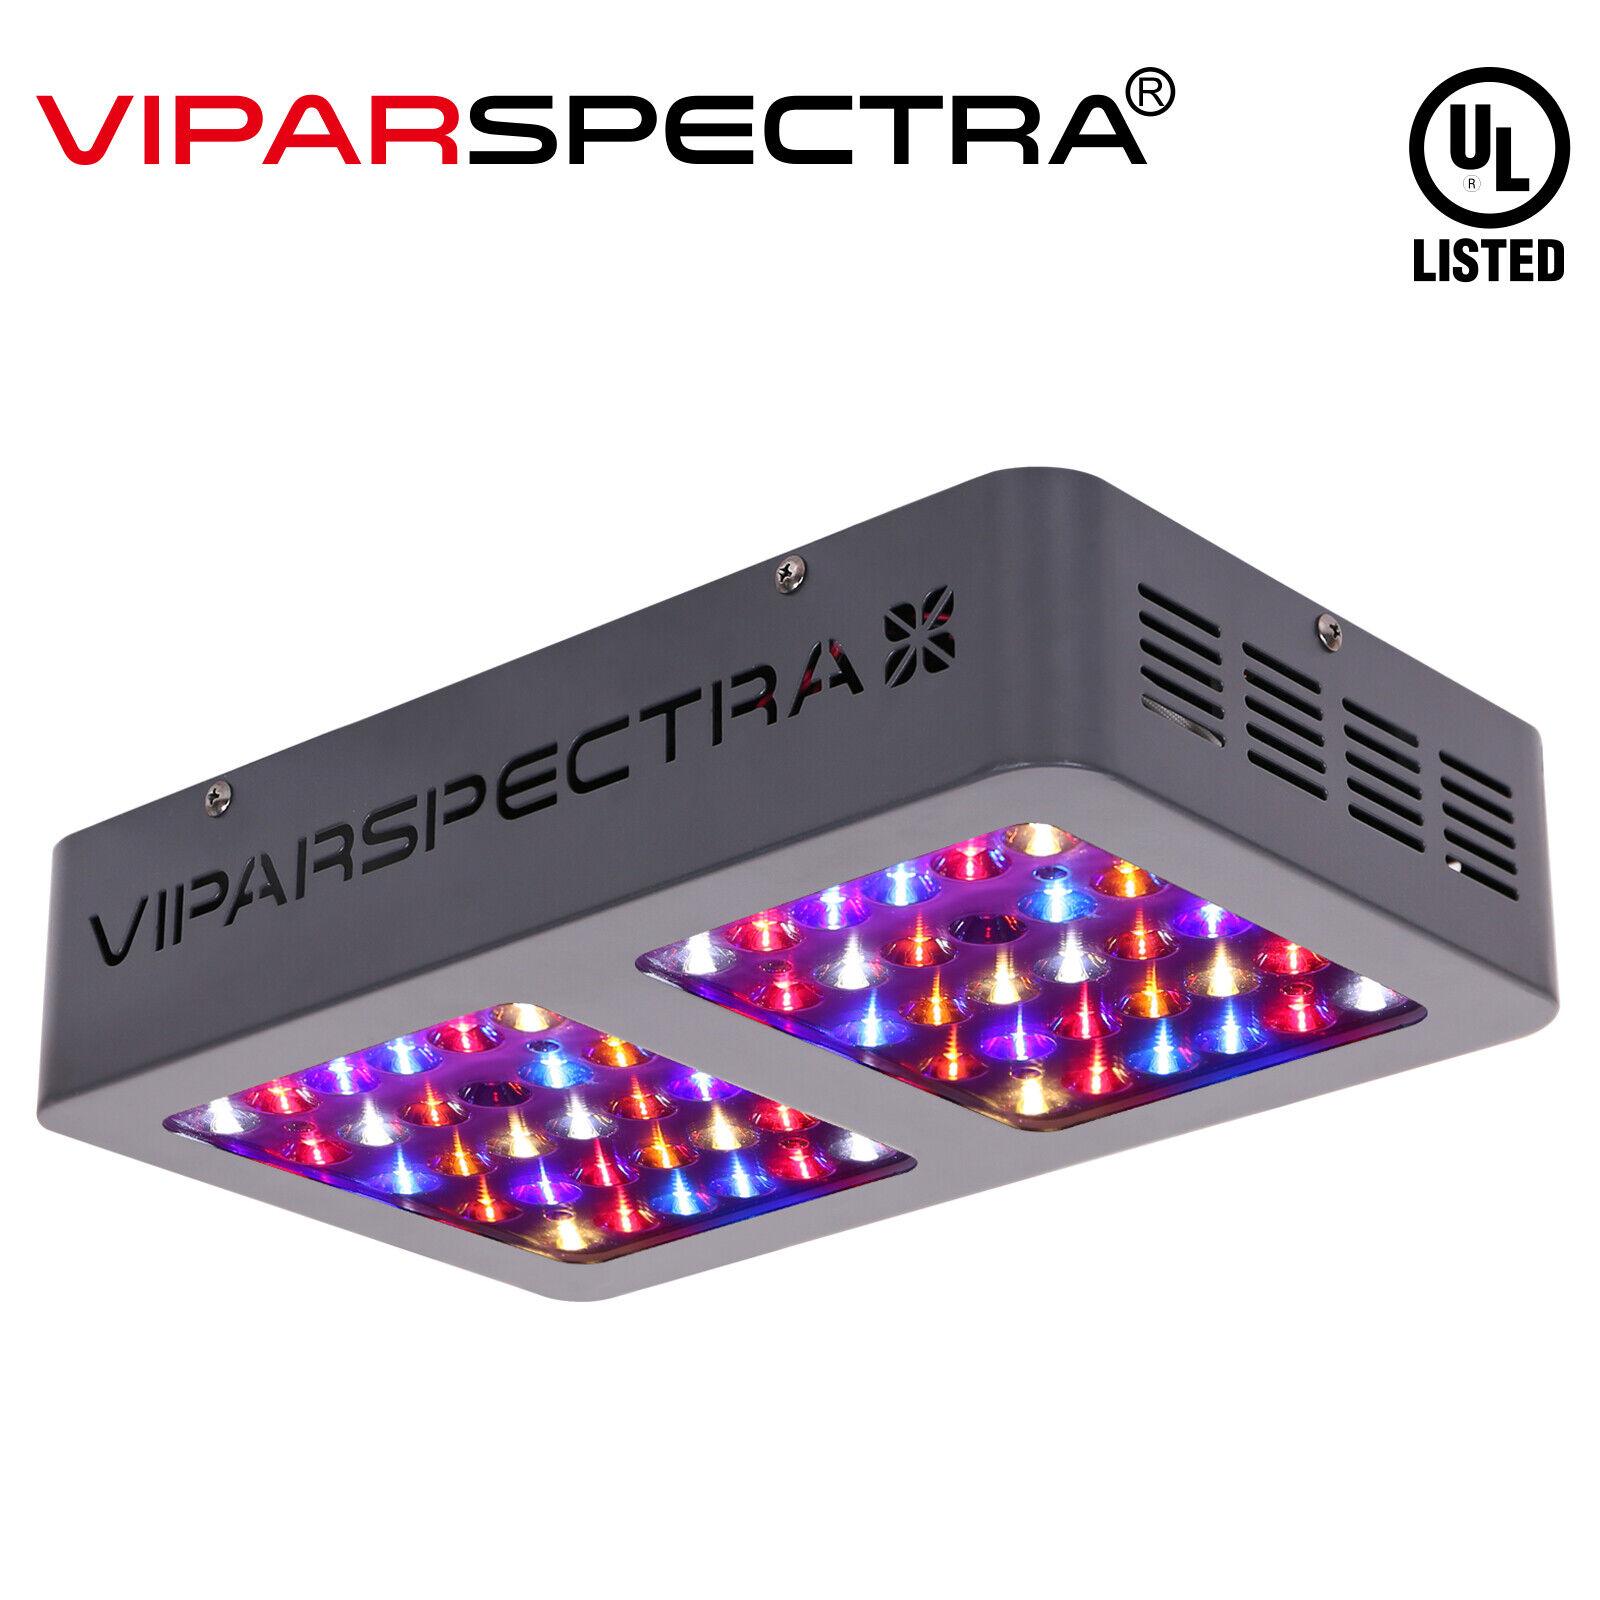 1200//2000//4000W LED Grow Light Panel Lamp Full Spectrum Hydroponic Plant Growing